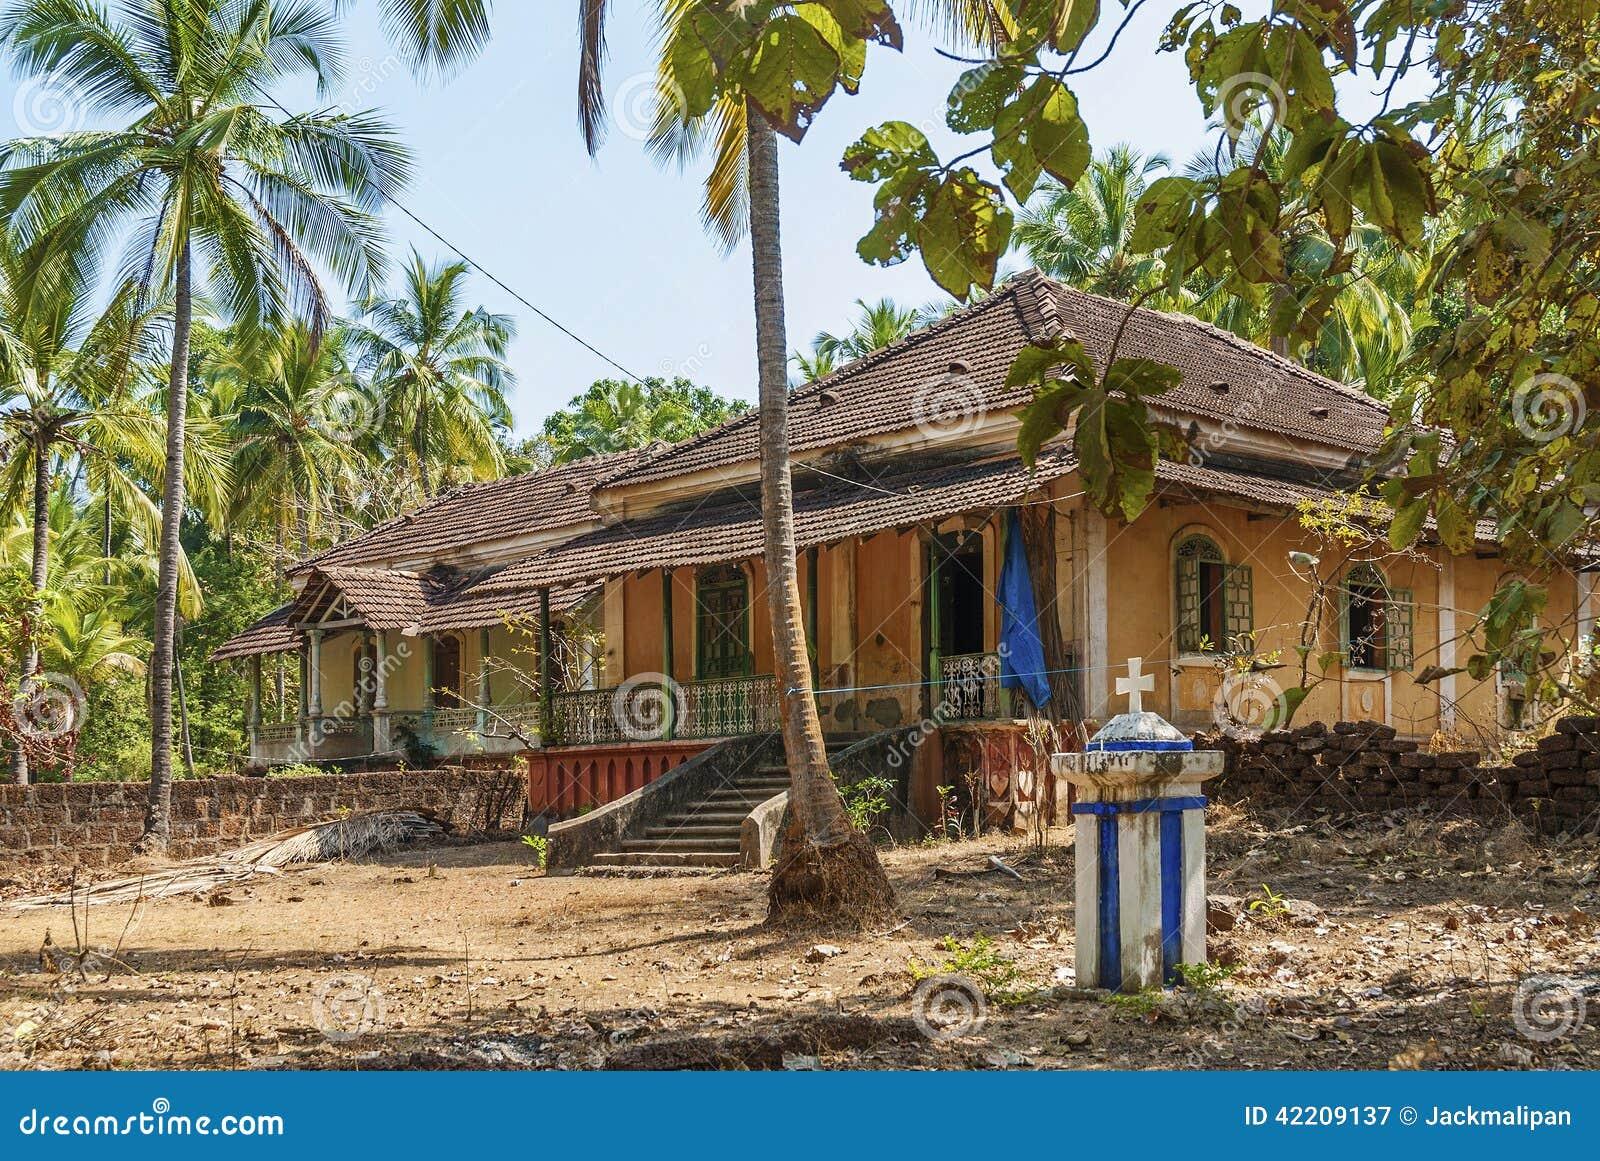 Casas coloniales viejas en el goa la india fotograf a for Casa de jardin varca goa